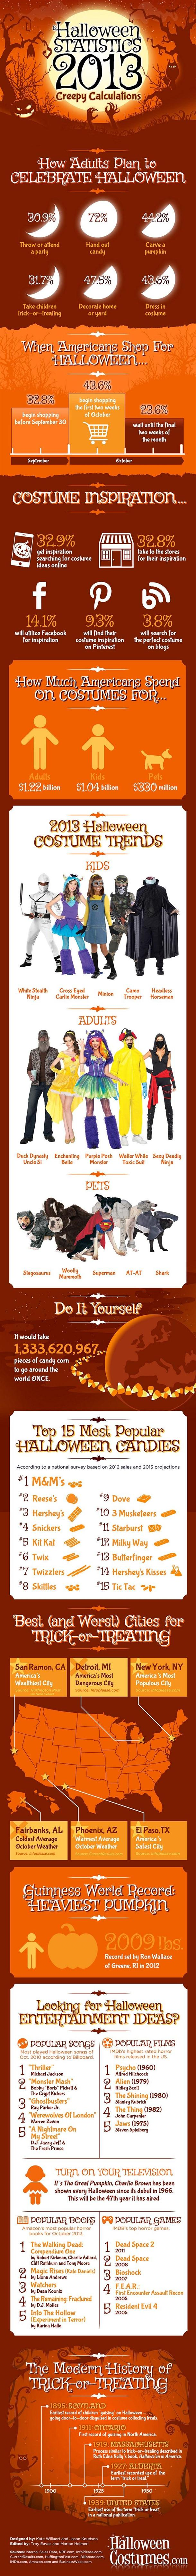 Halloween Habits and Statistics 2013-Infographic